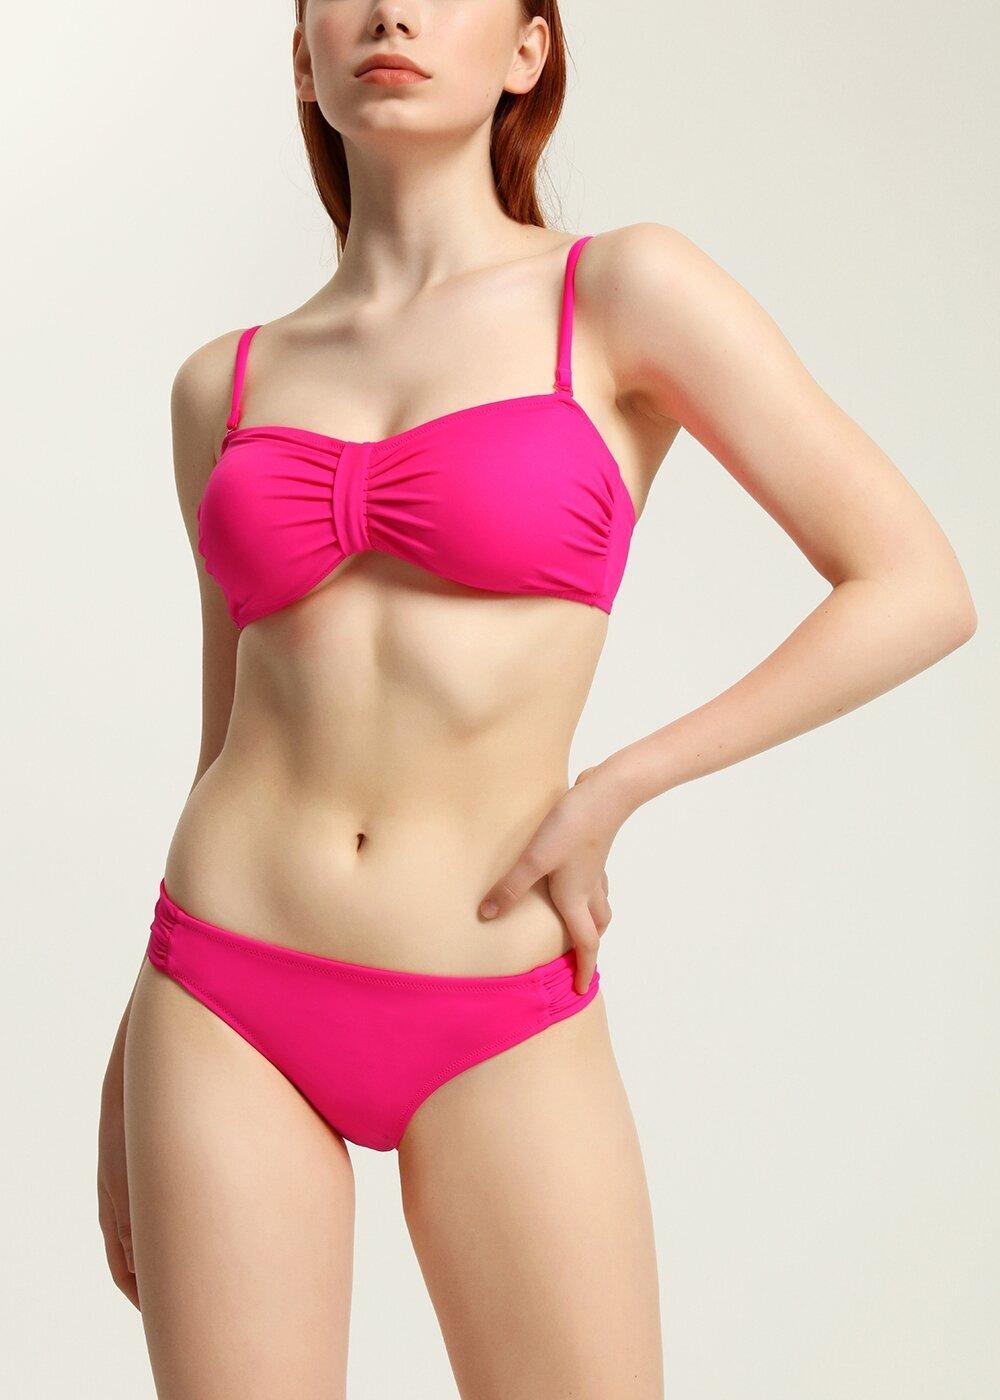 resm Luplu Straplez Bikini Üst - ŞEKER PEMBESİ